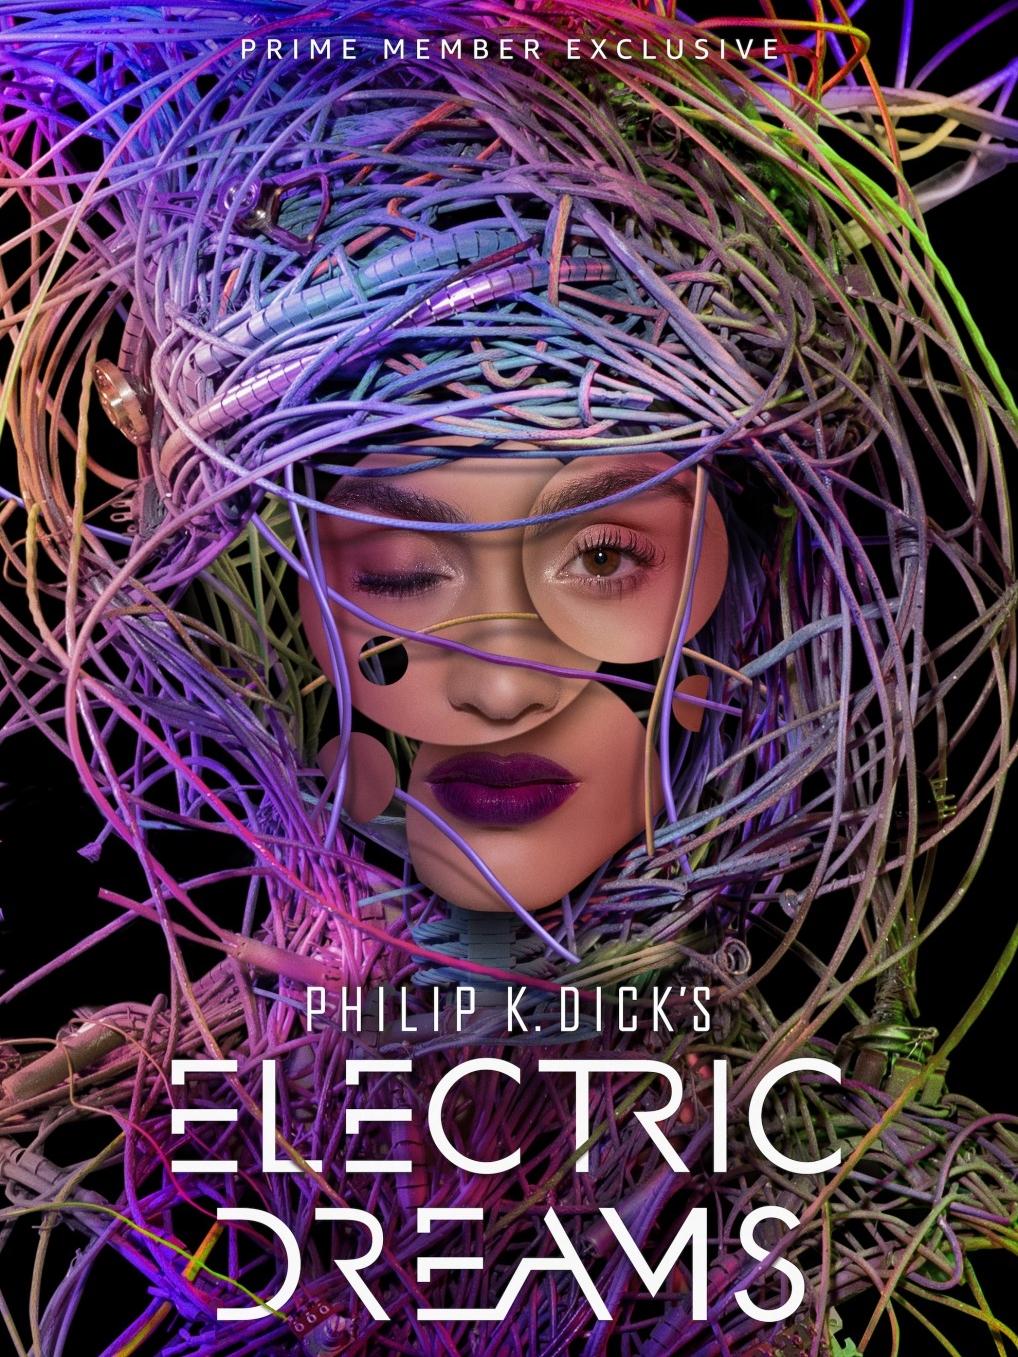 Philip K. Dick's Electric Dreams - Série 2017 - AdoroCinema